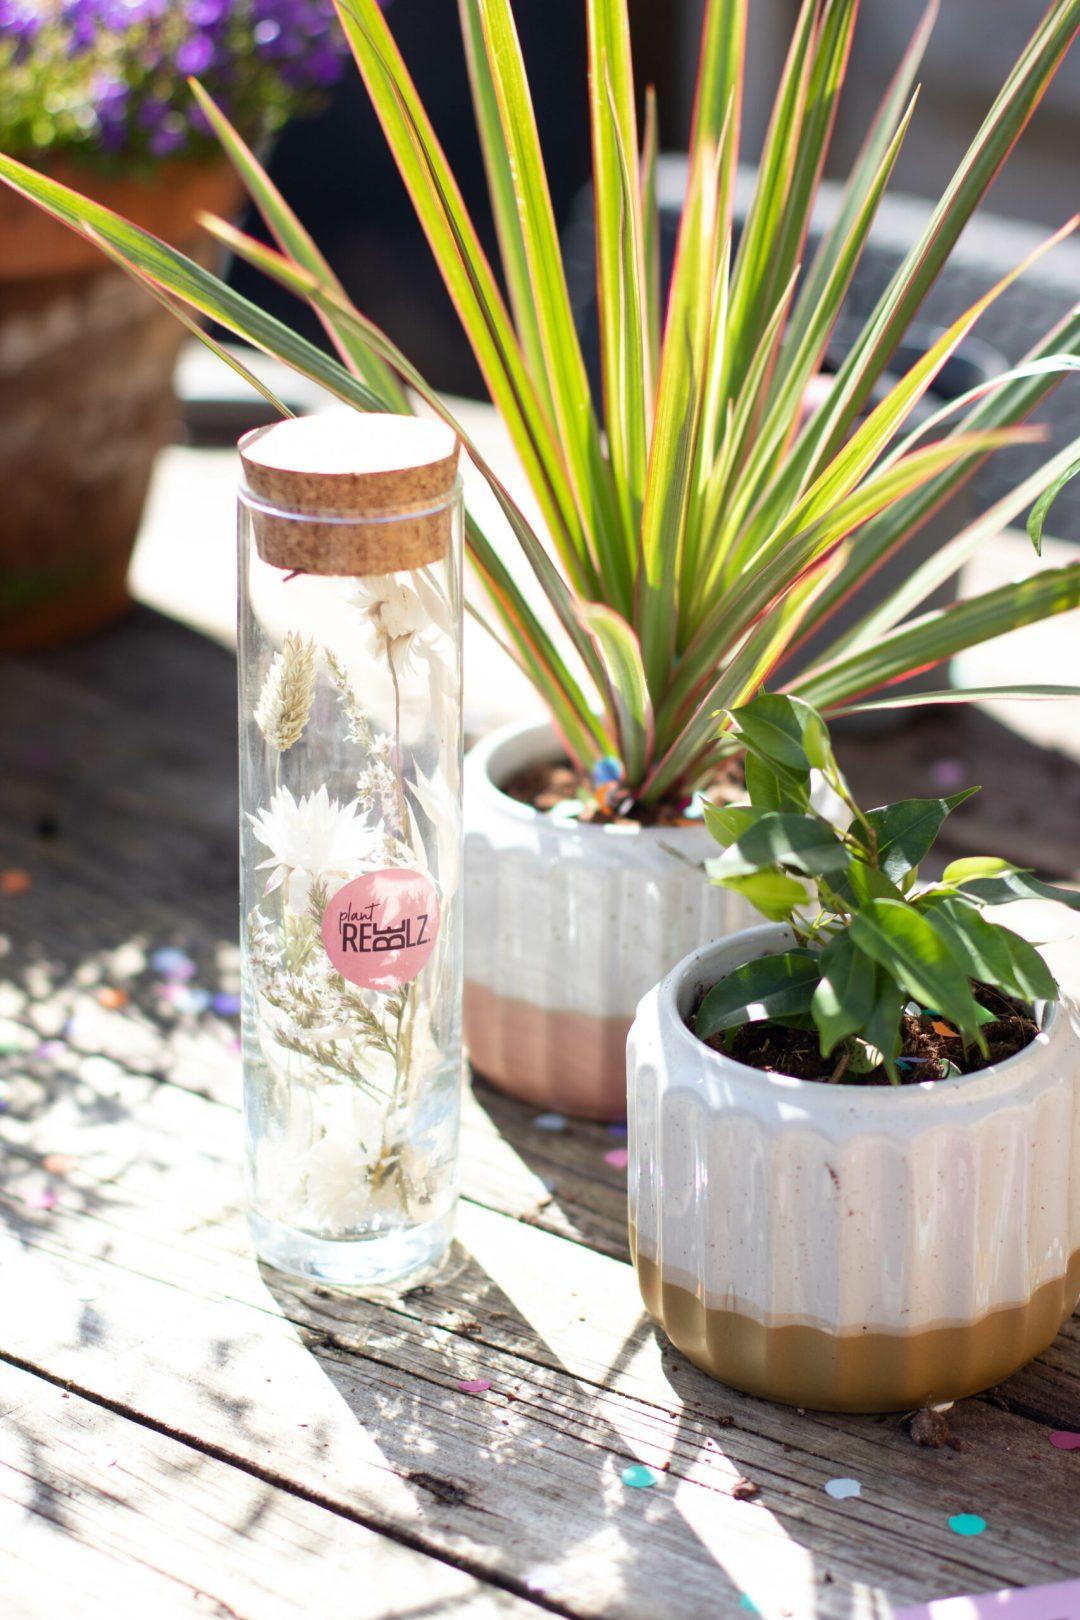 Vier de lente met Plant Rebelz!